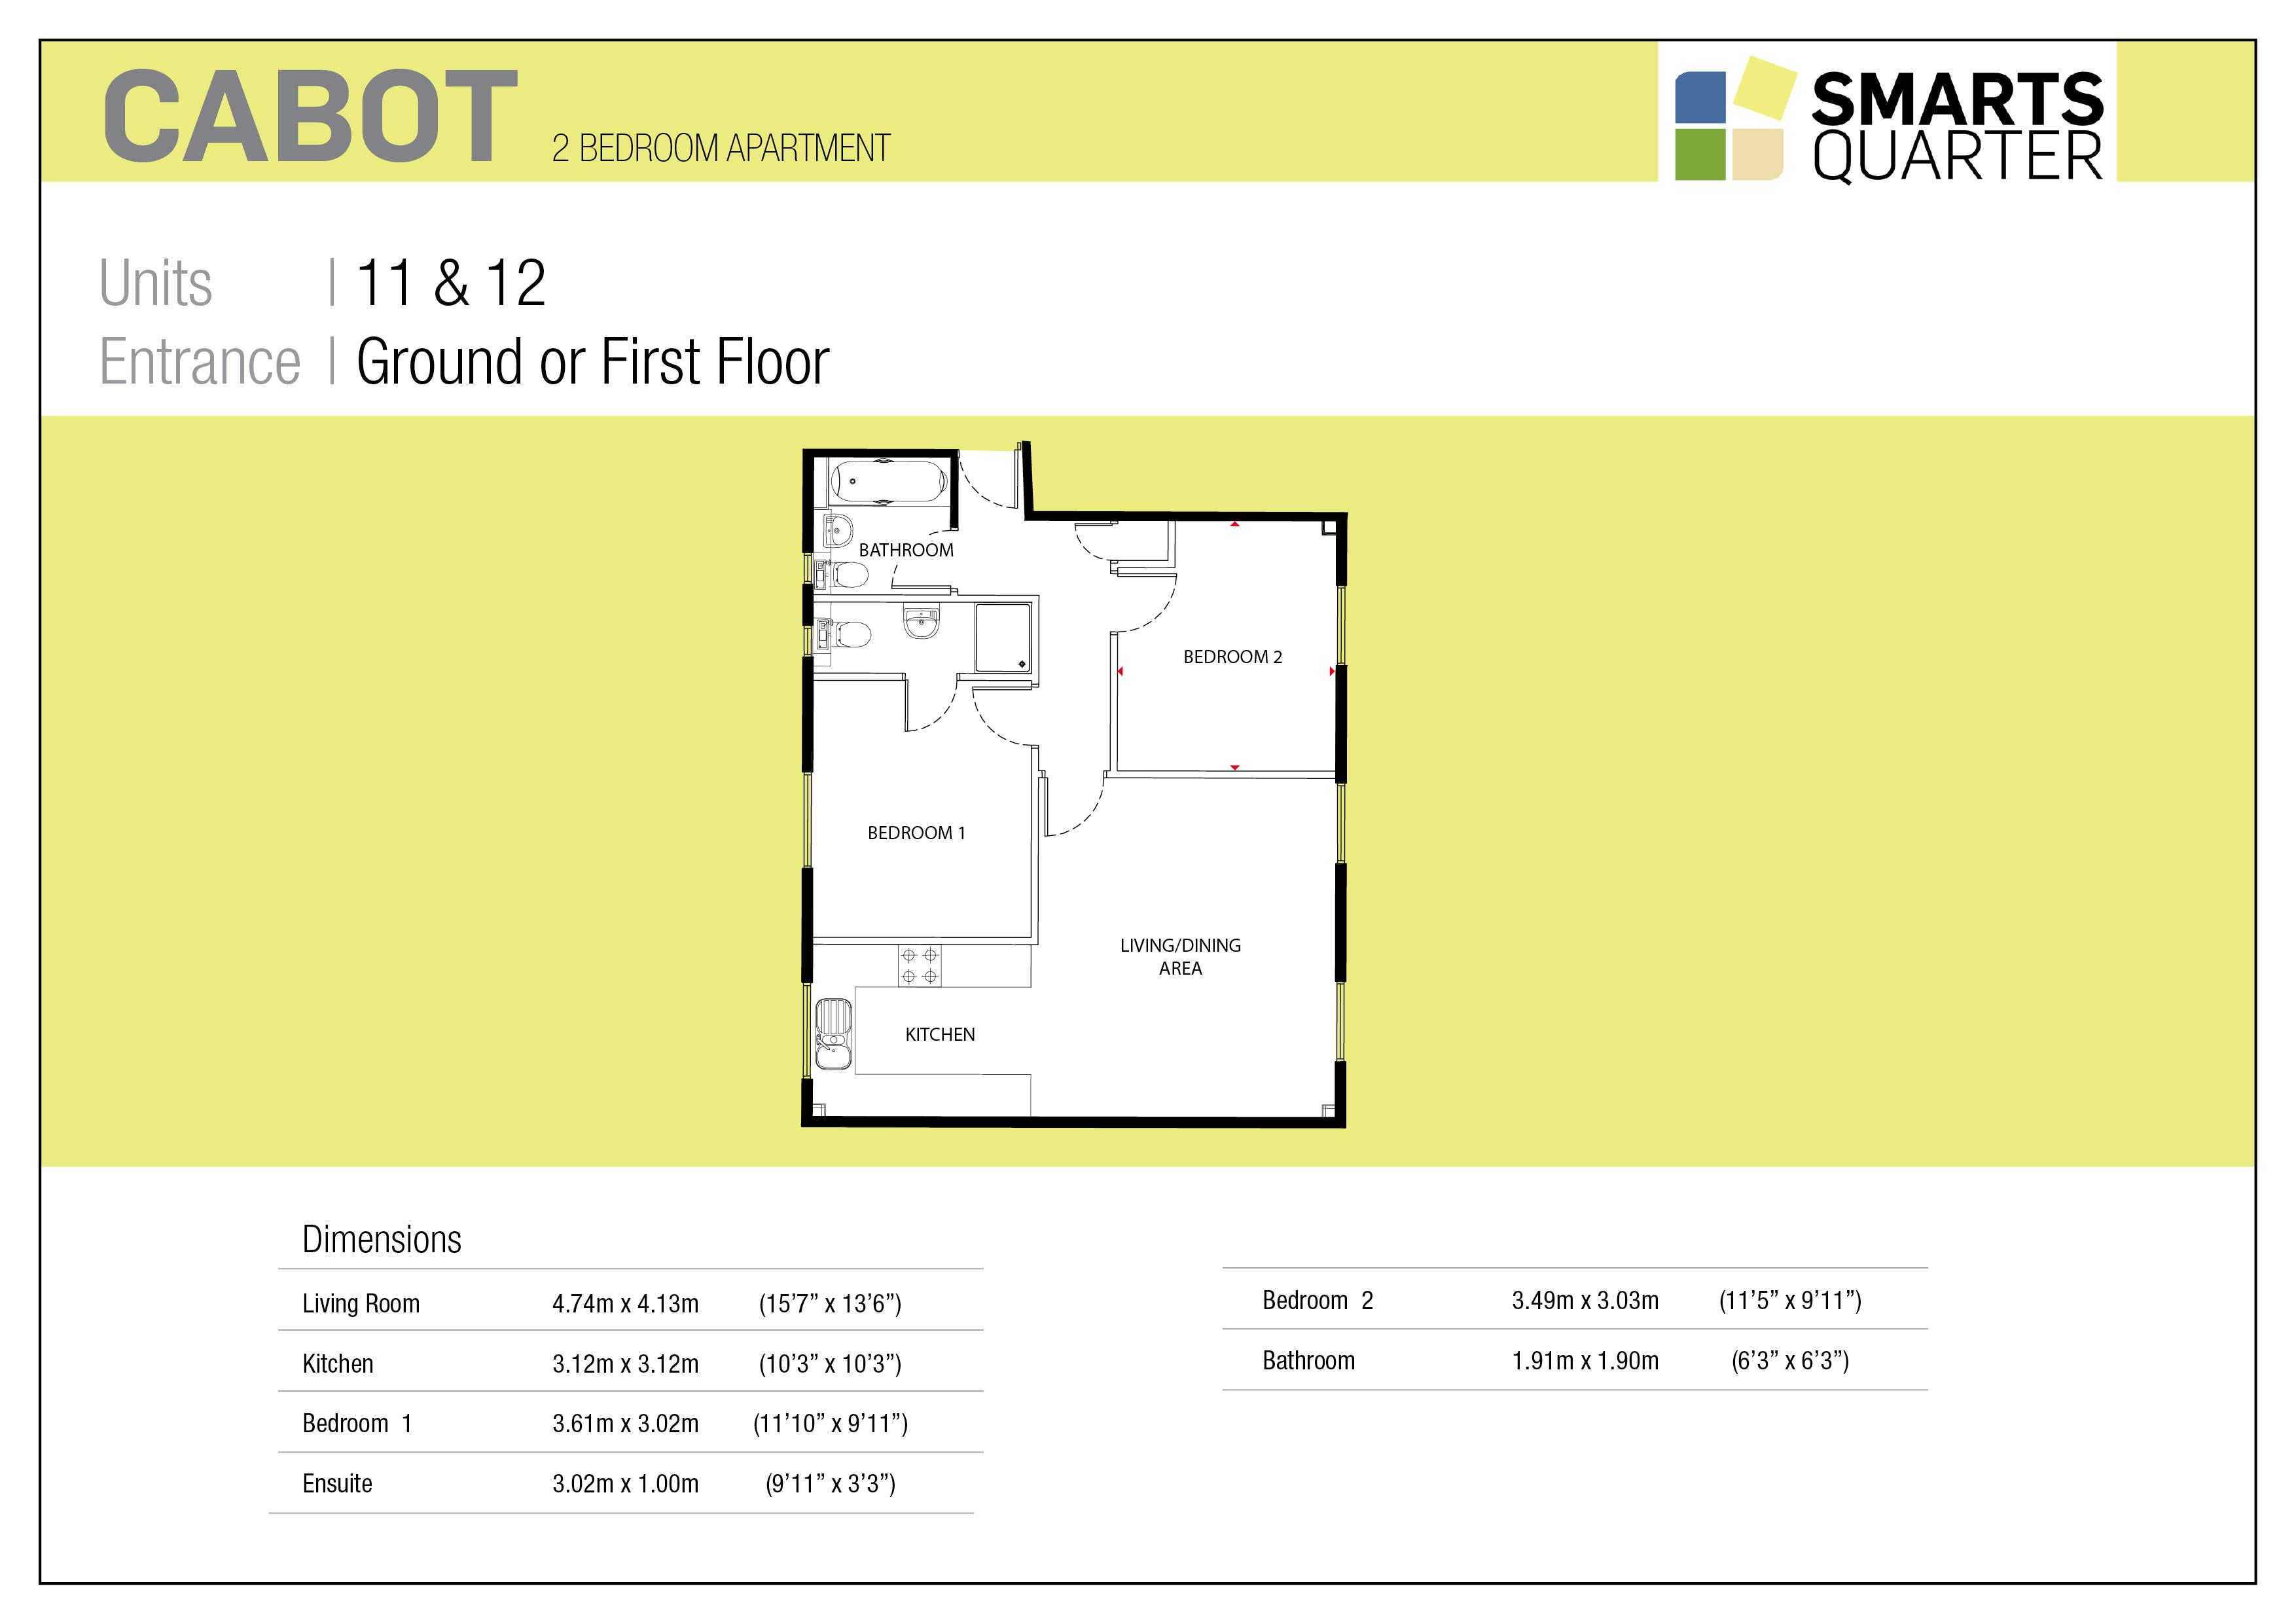 New Smarts Quarter Development Bristol Cabot Floorplan